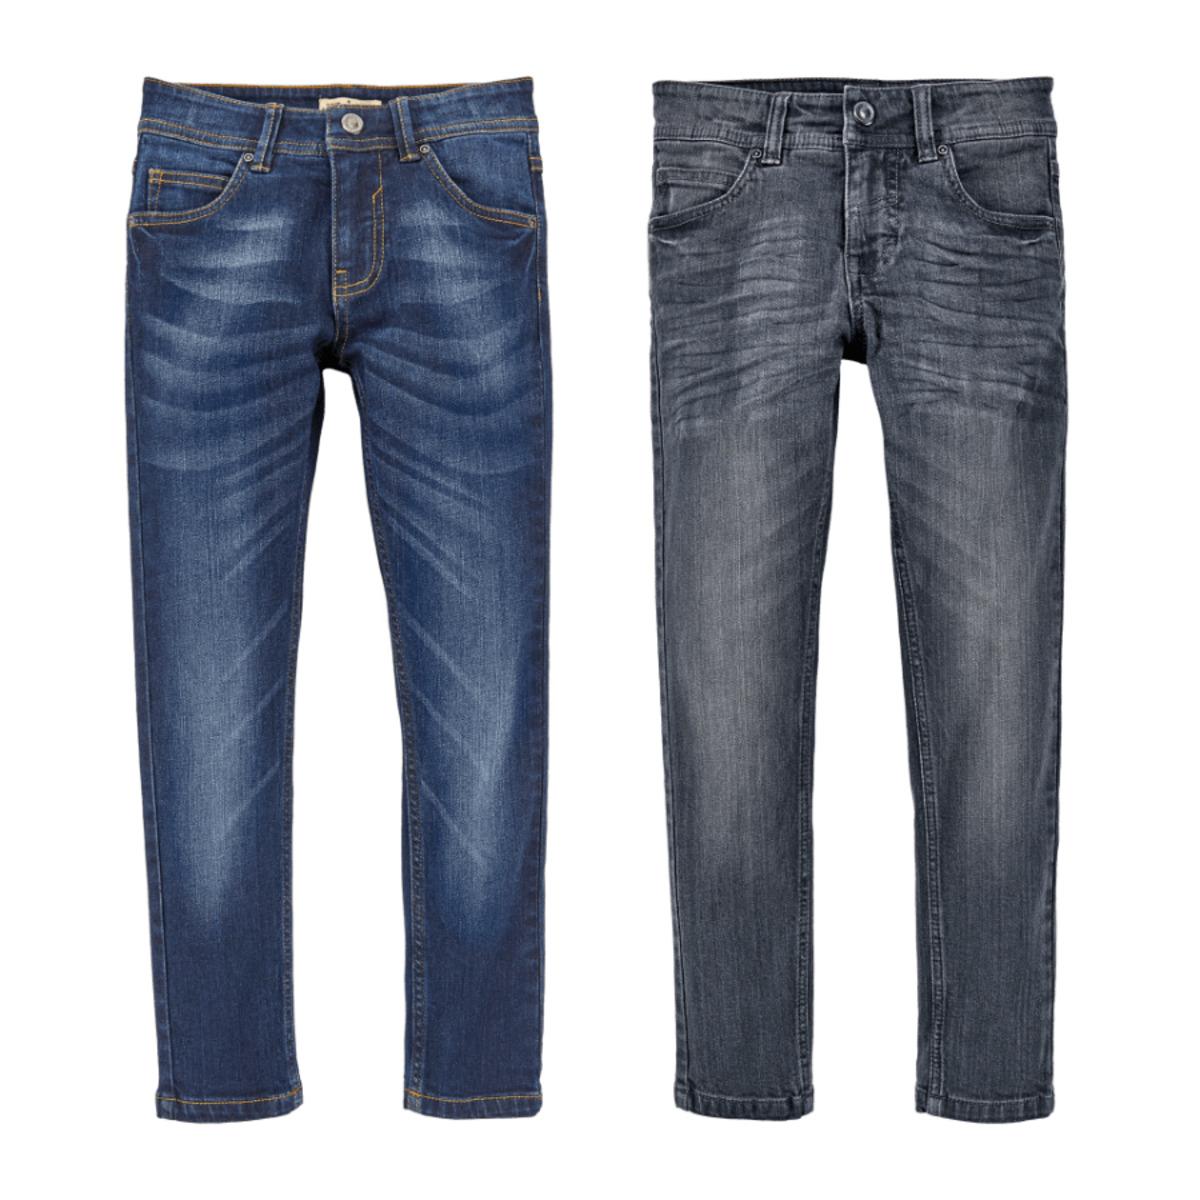 Bild 1 von POCOPIANO     Jeans